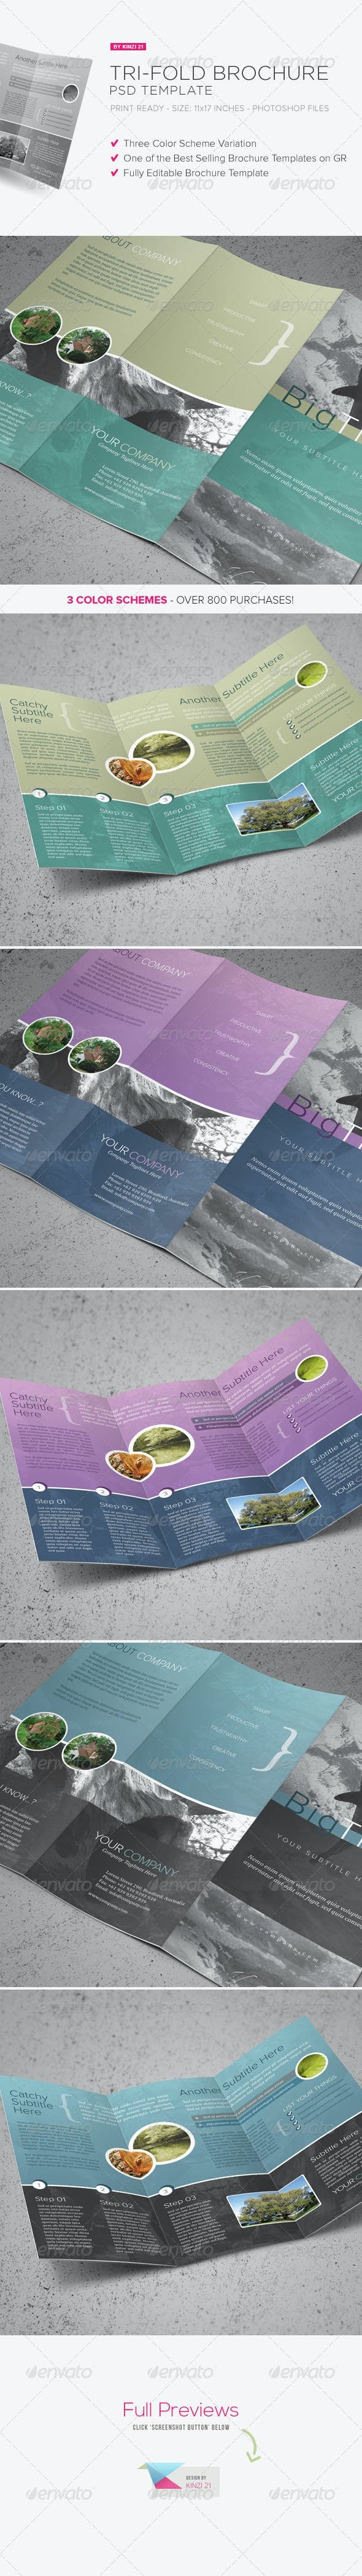 tri fold brochure psd template by kinzi21 graphicriver